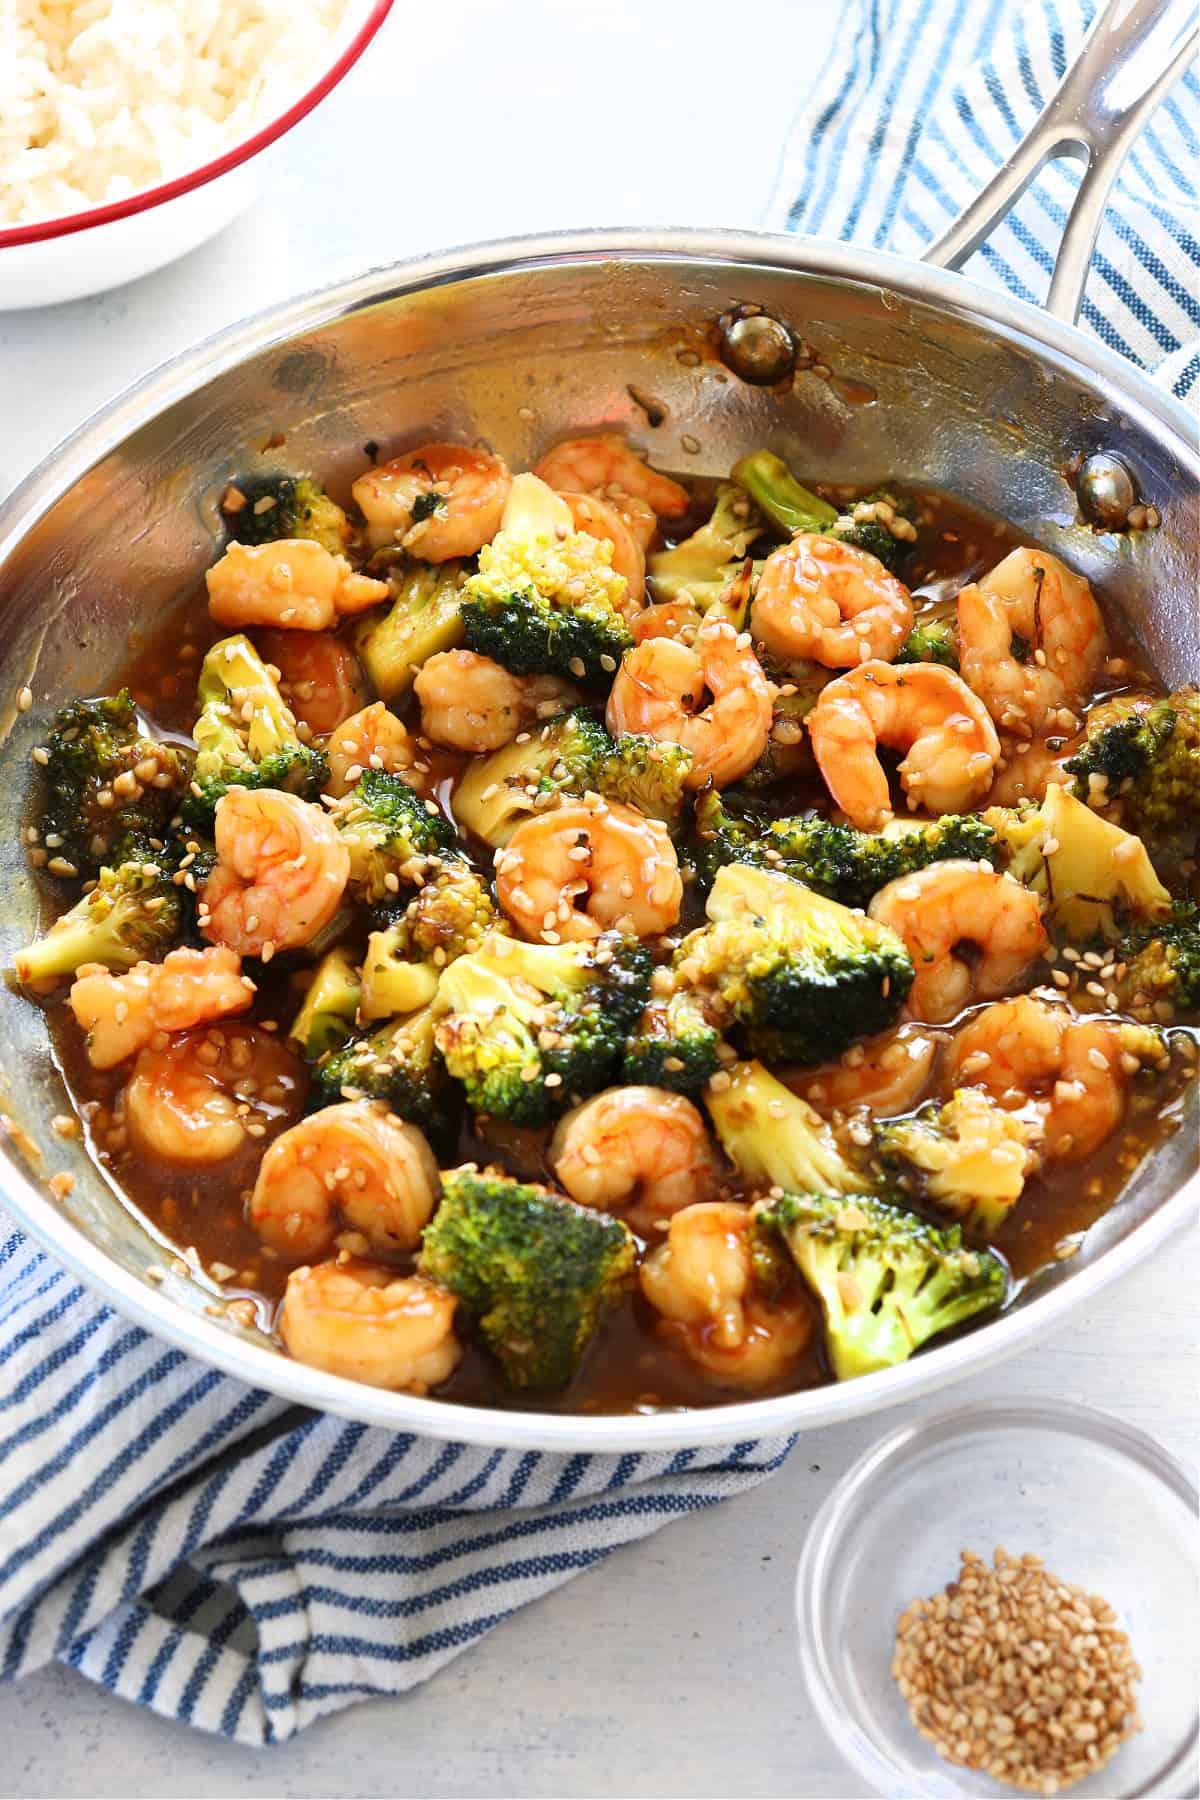 shrimp and broccoli 4 Shrimp and Broccoli